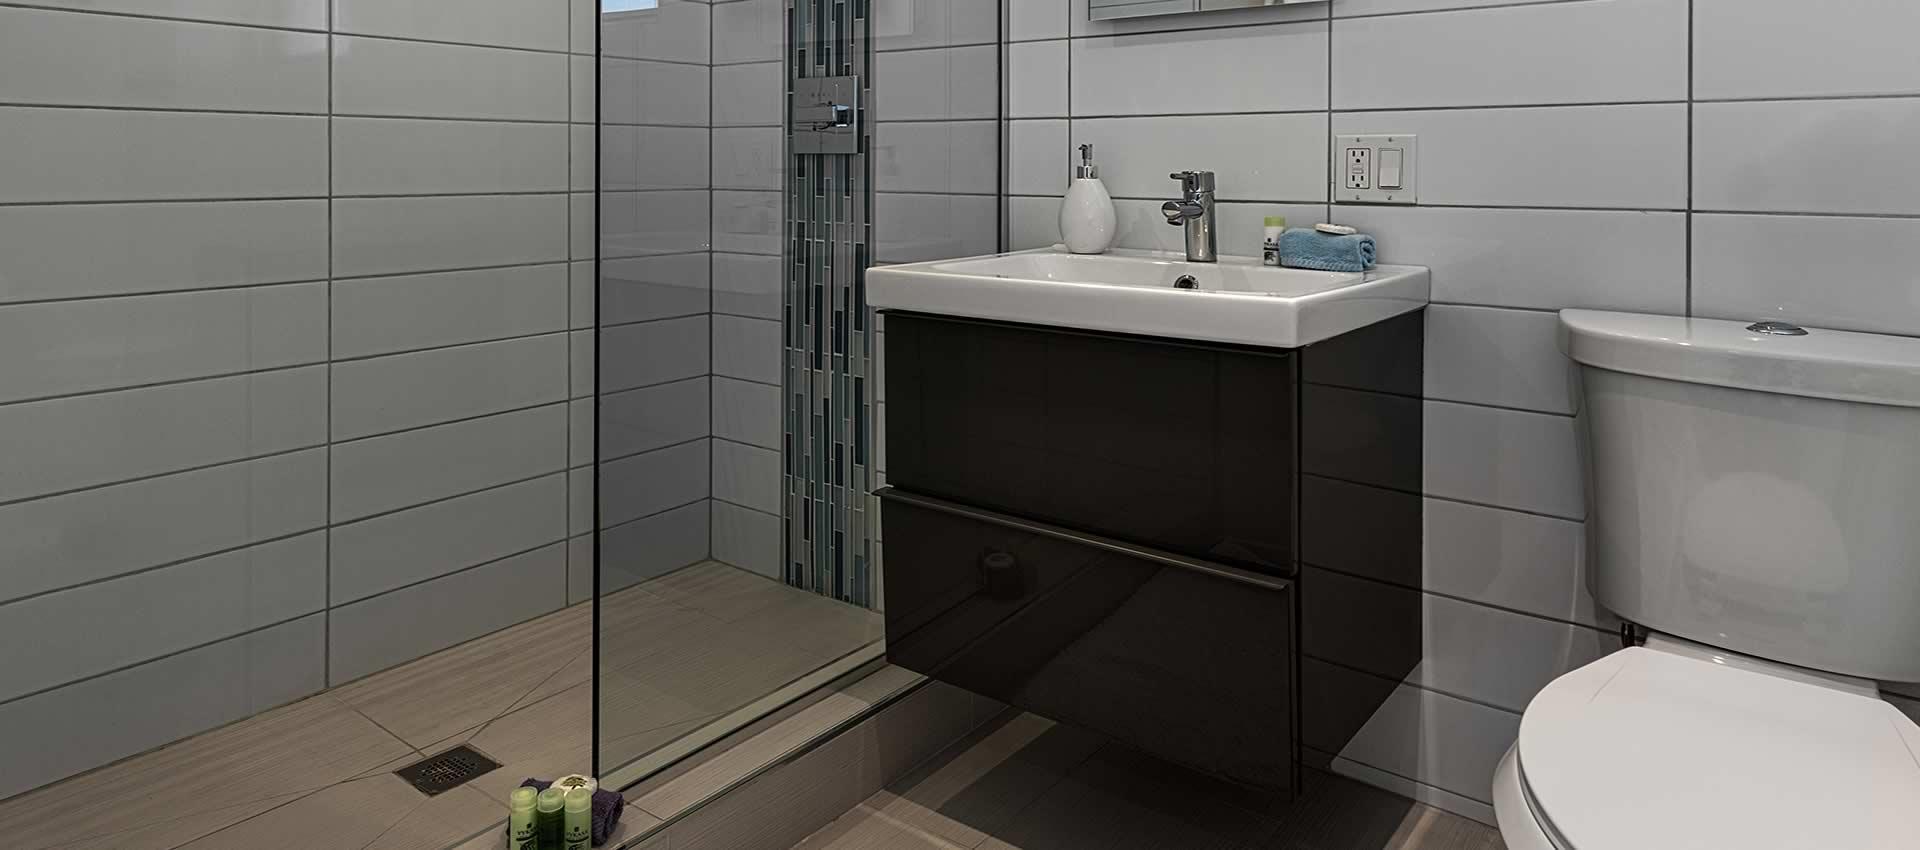 twist-hotel-room218-bath